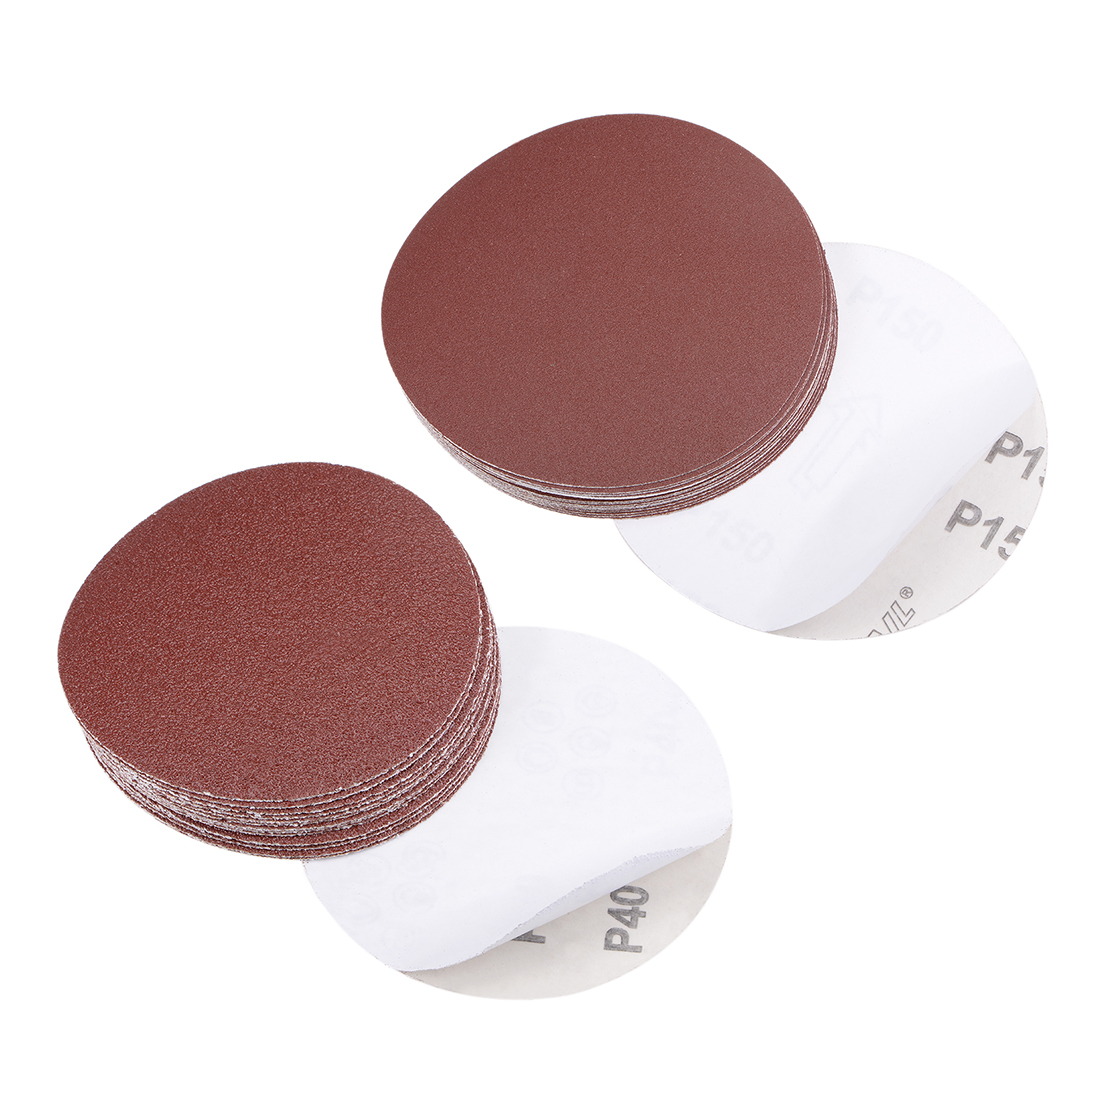 uxcell 6-Inch PSA Sanding Disc Aluminum Oxide Adhesive Back Sandpaper Yellow 40 Grit 10 Pcs